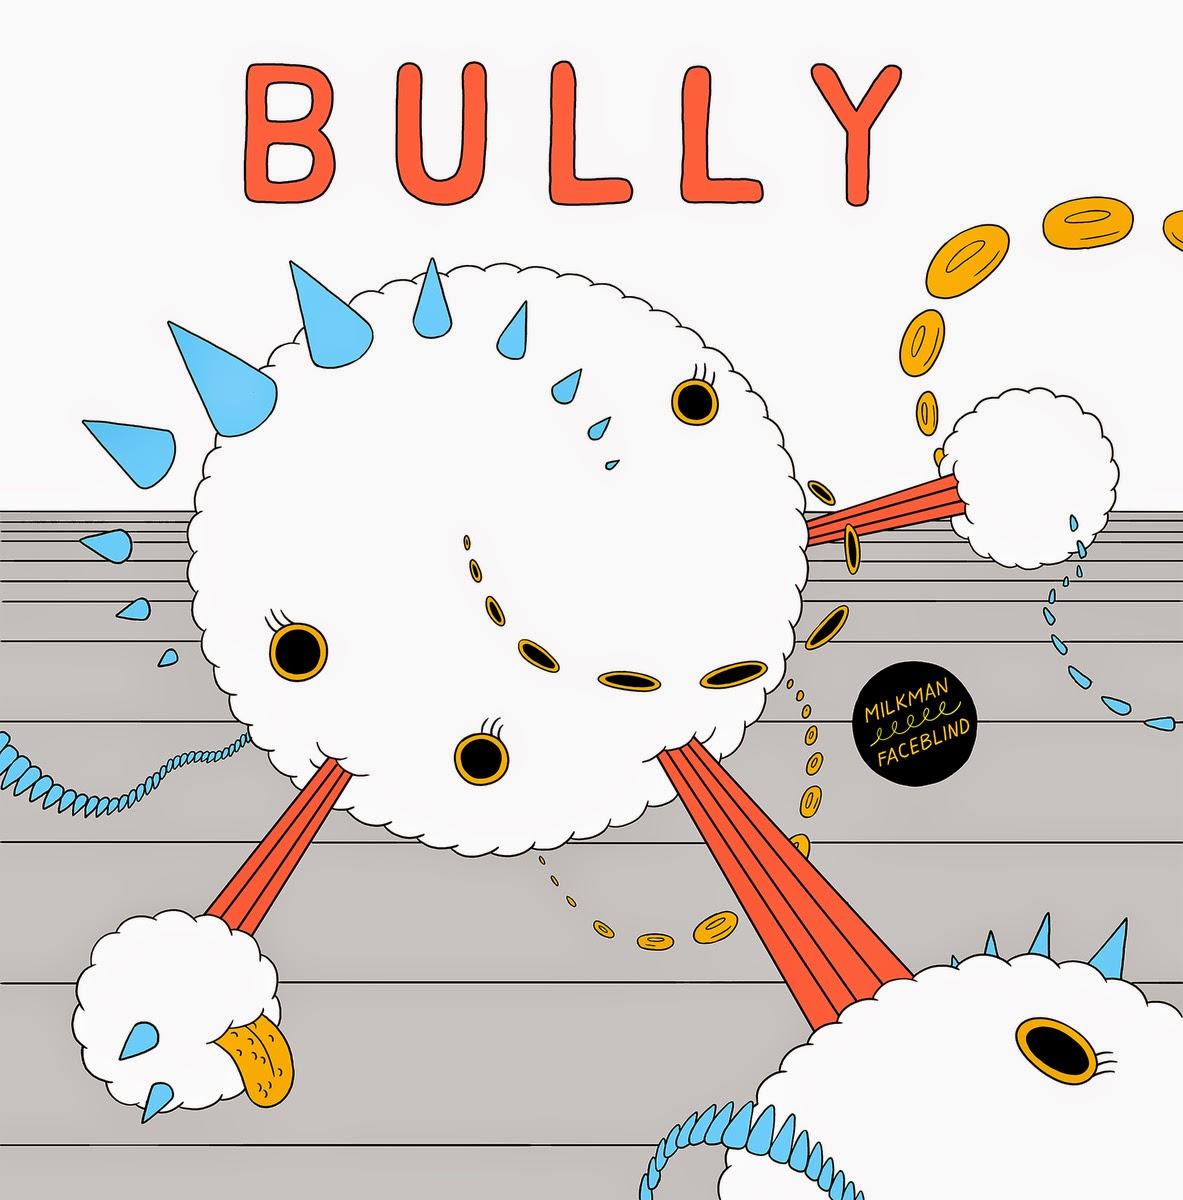 http://www.thelesigh.com/2014/04/7-bully-milkmanfaceblind.html#more